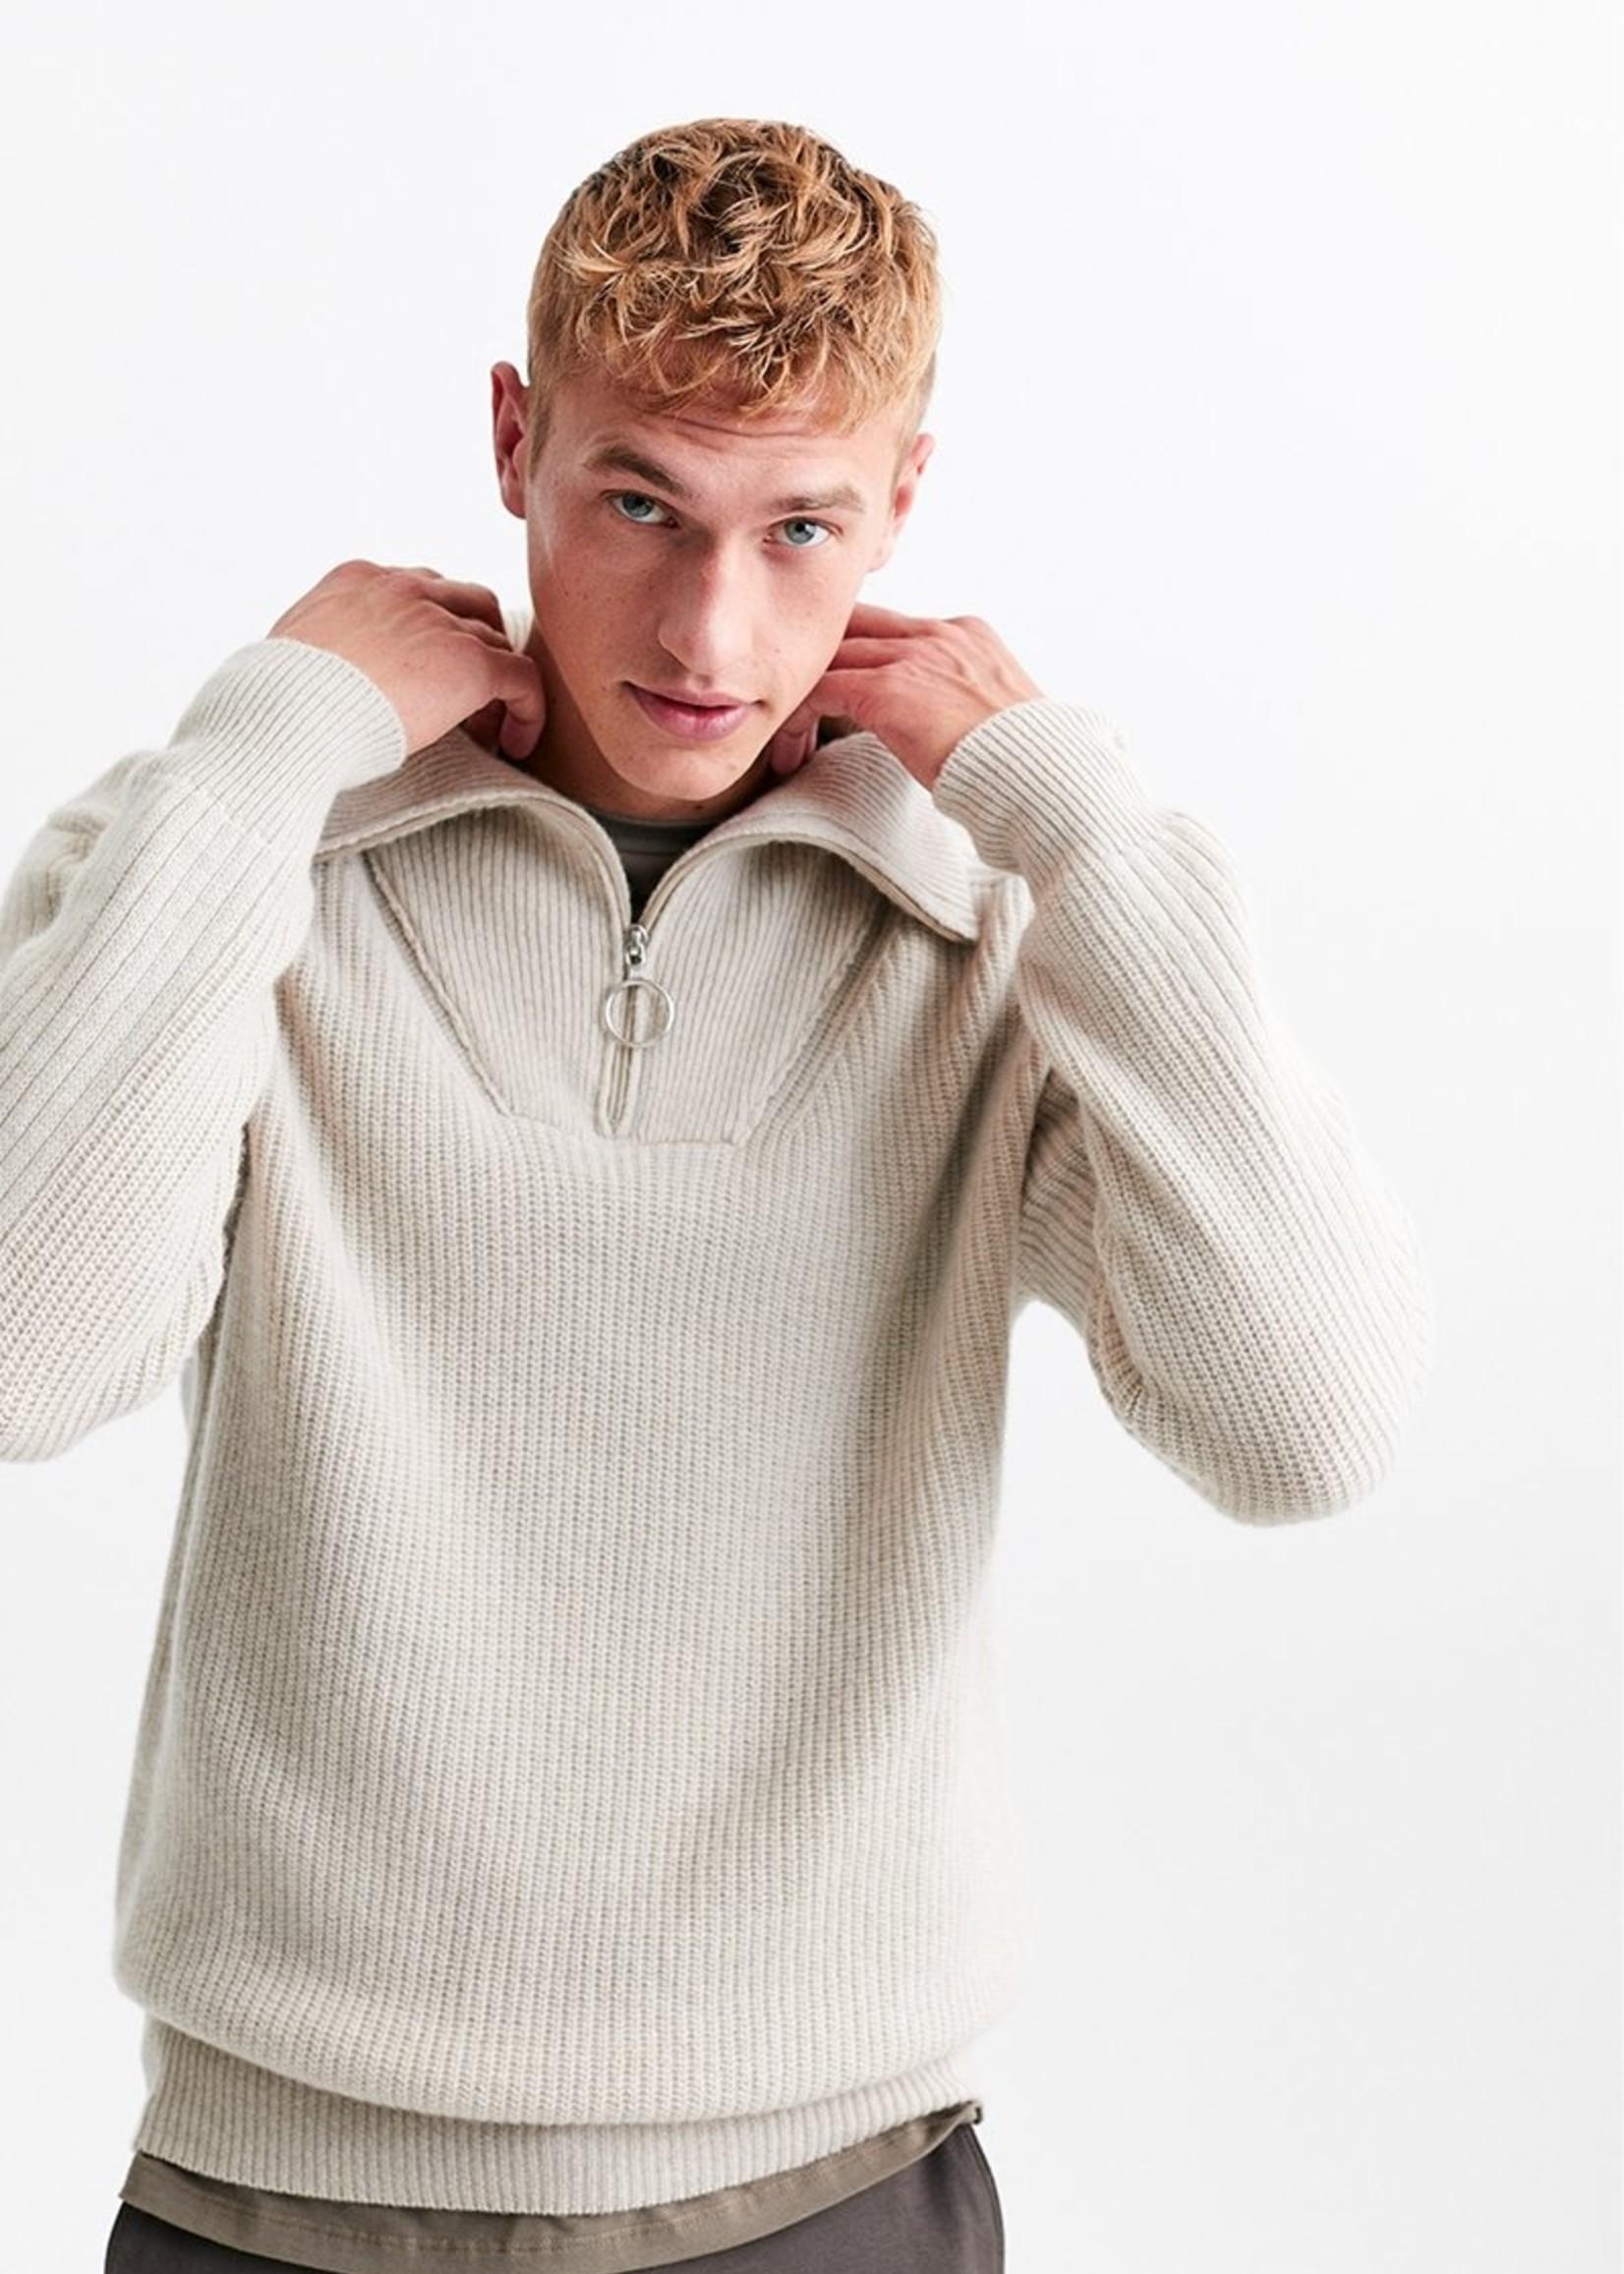 The GoodPeople Kzip Knit